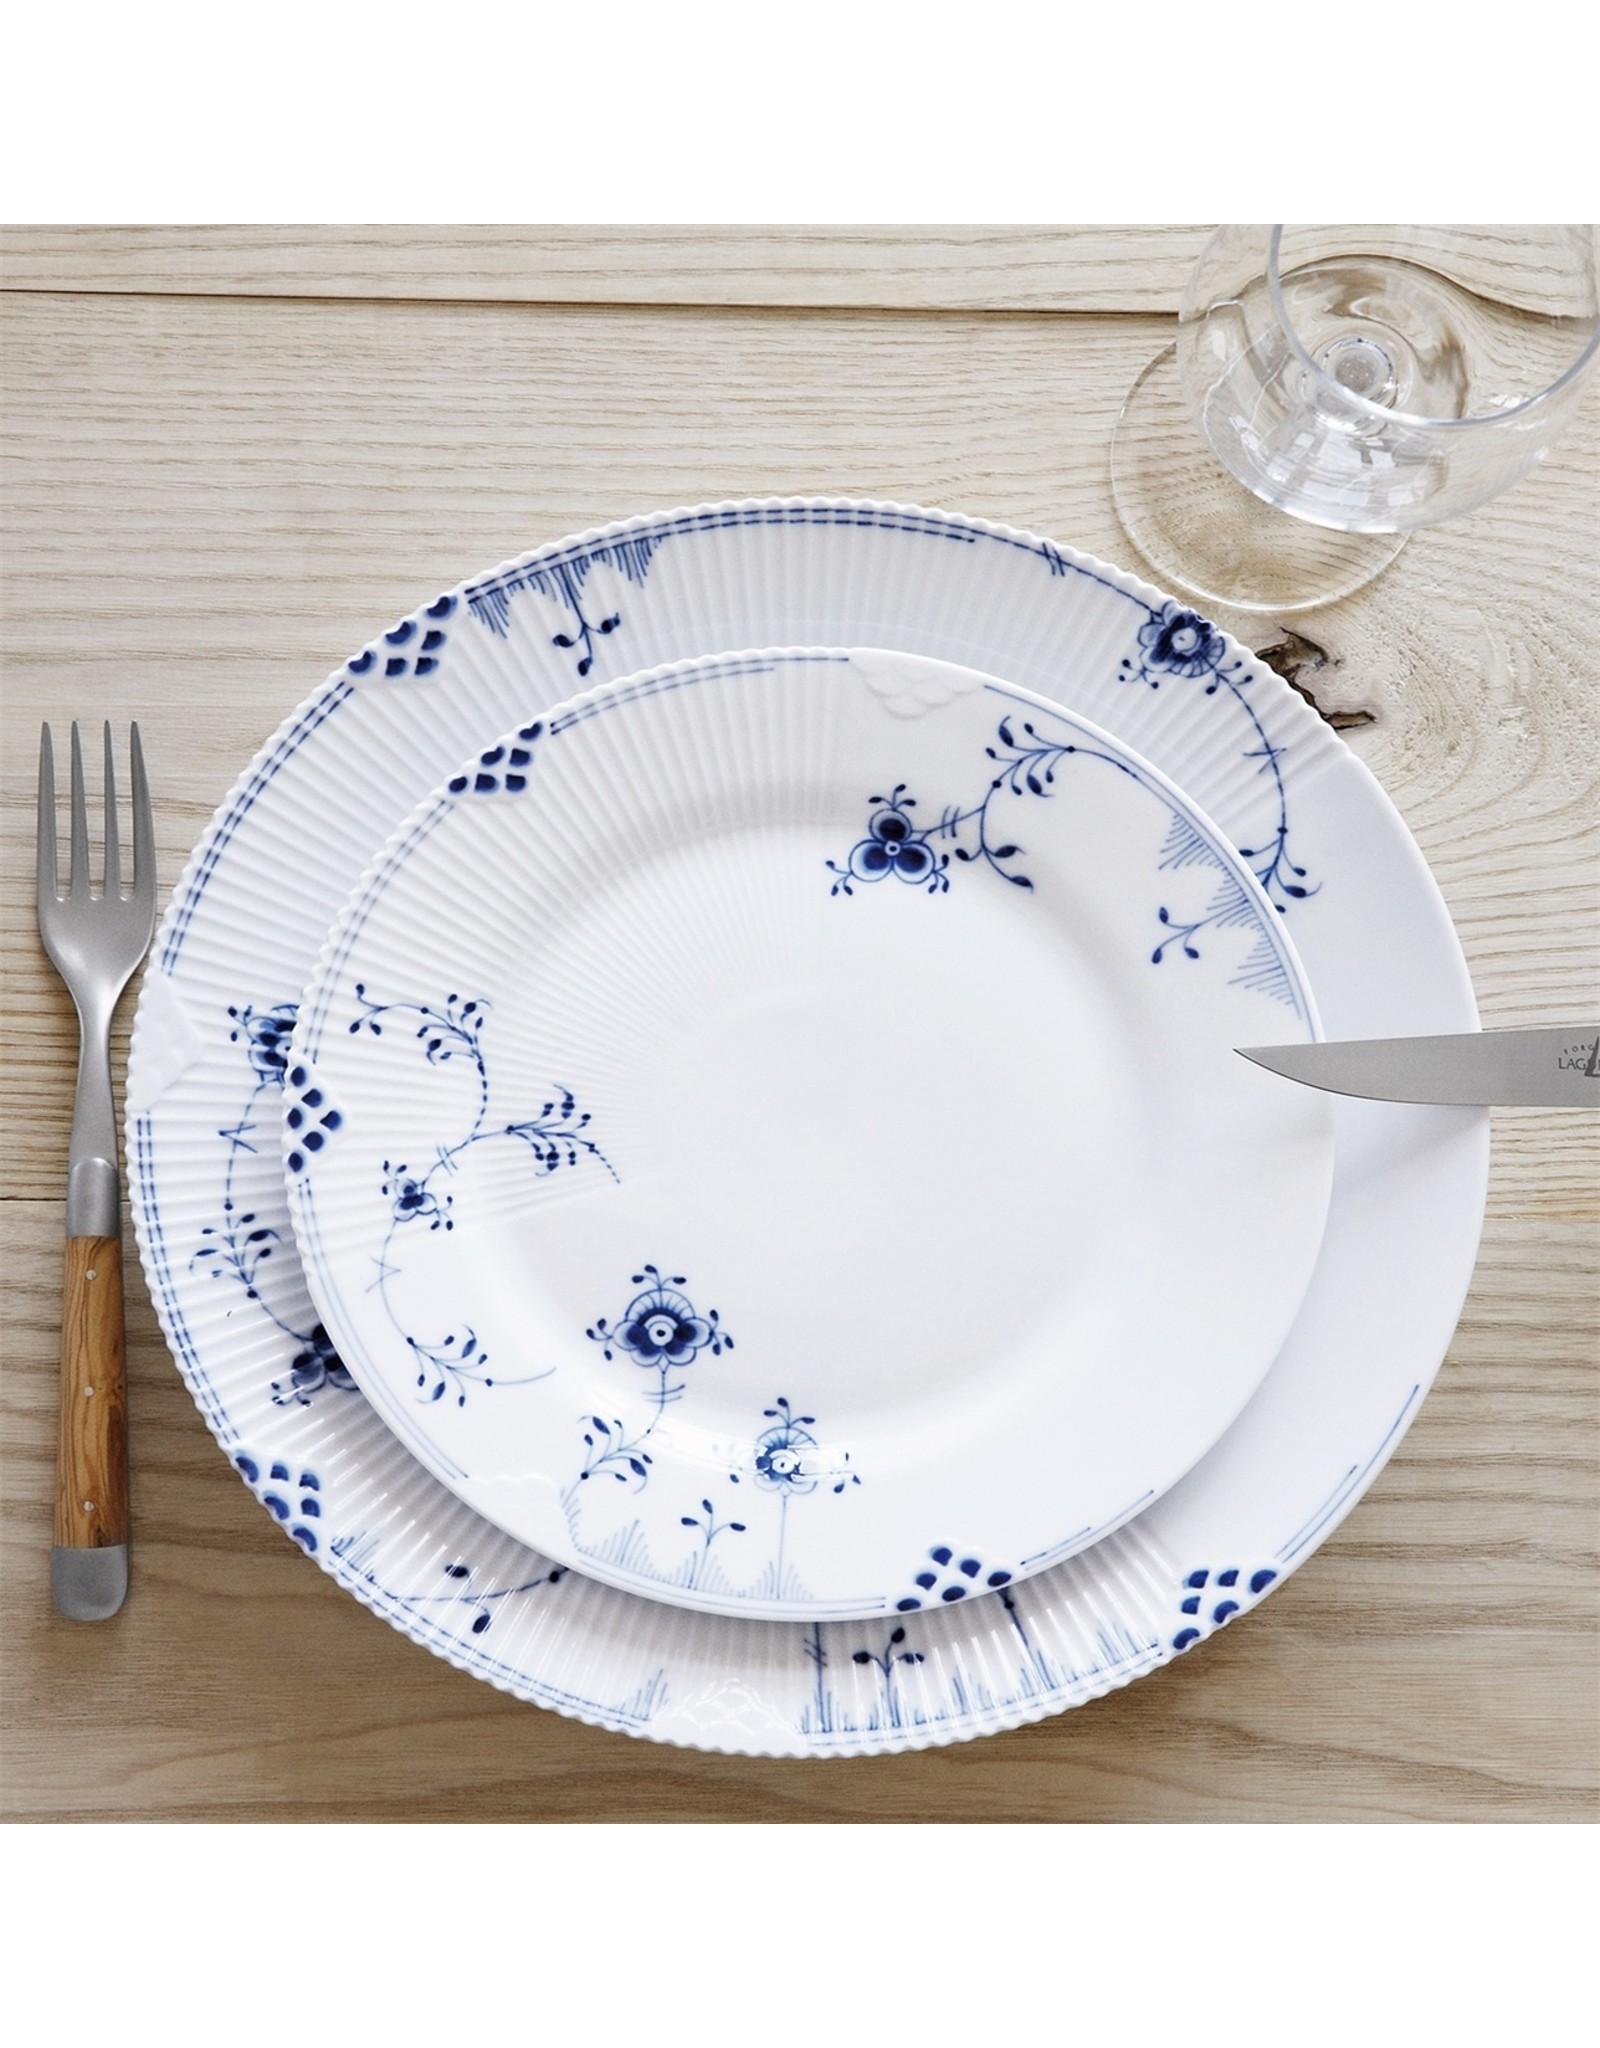 ROYAL COPENHAGEN BLUE ELEMENTS TABLEWARE